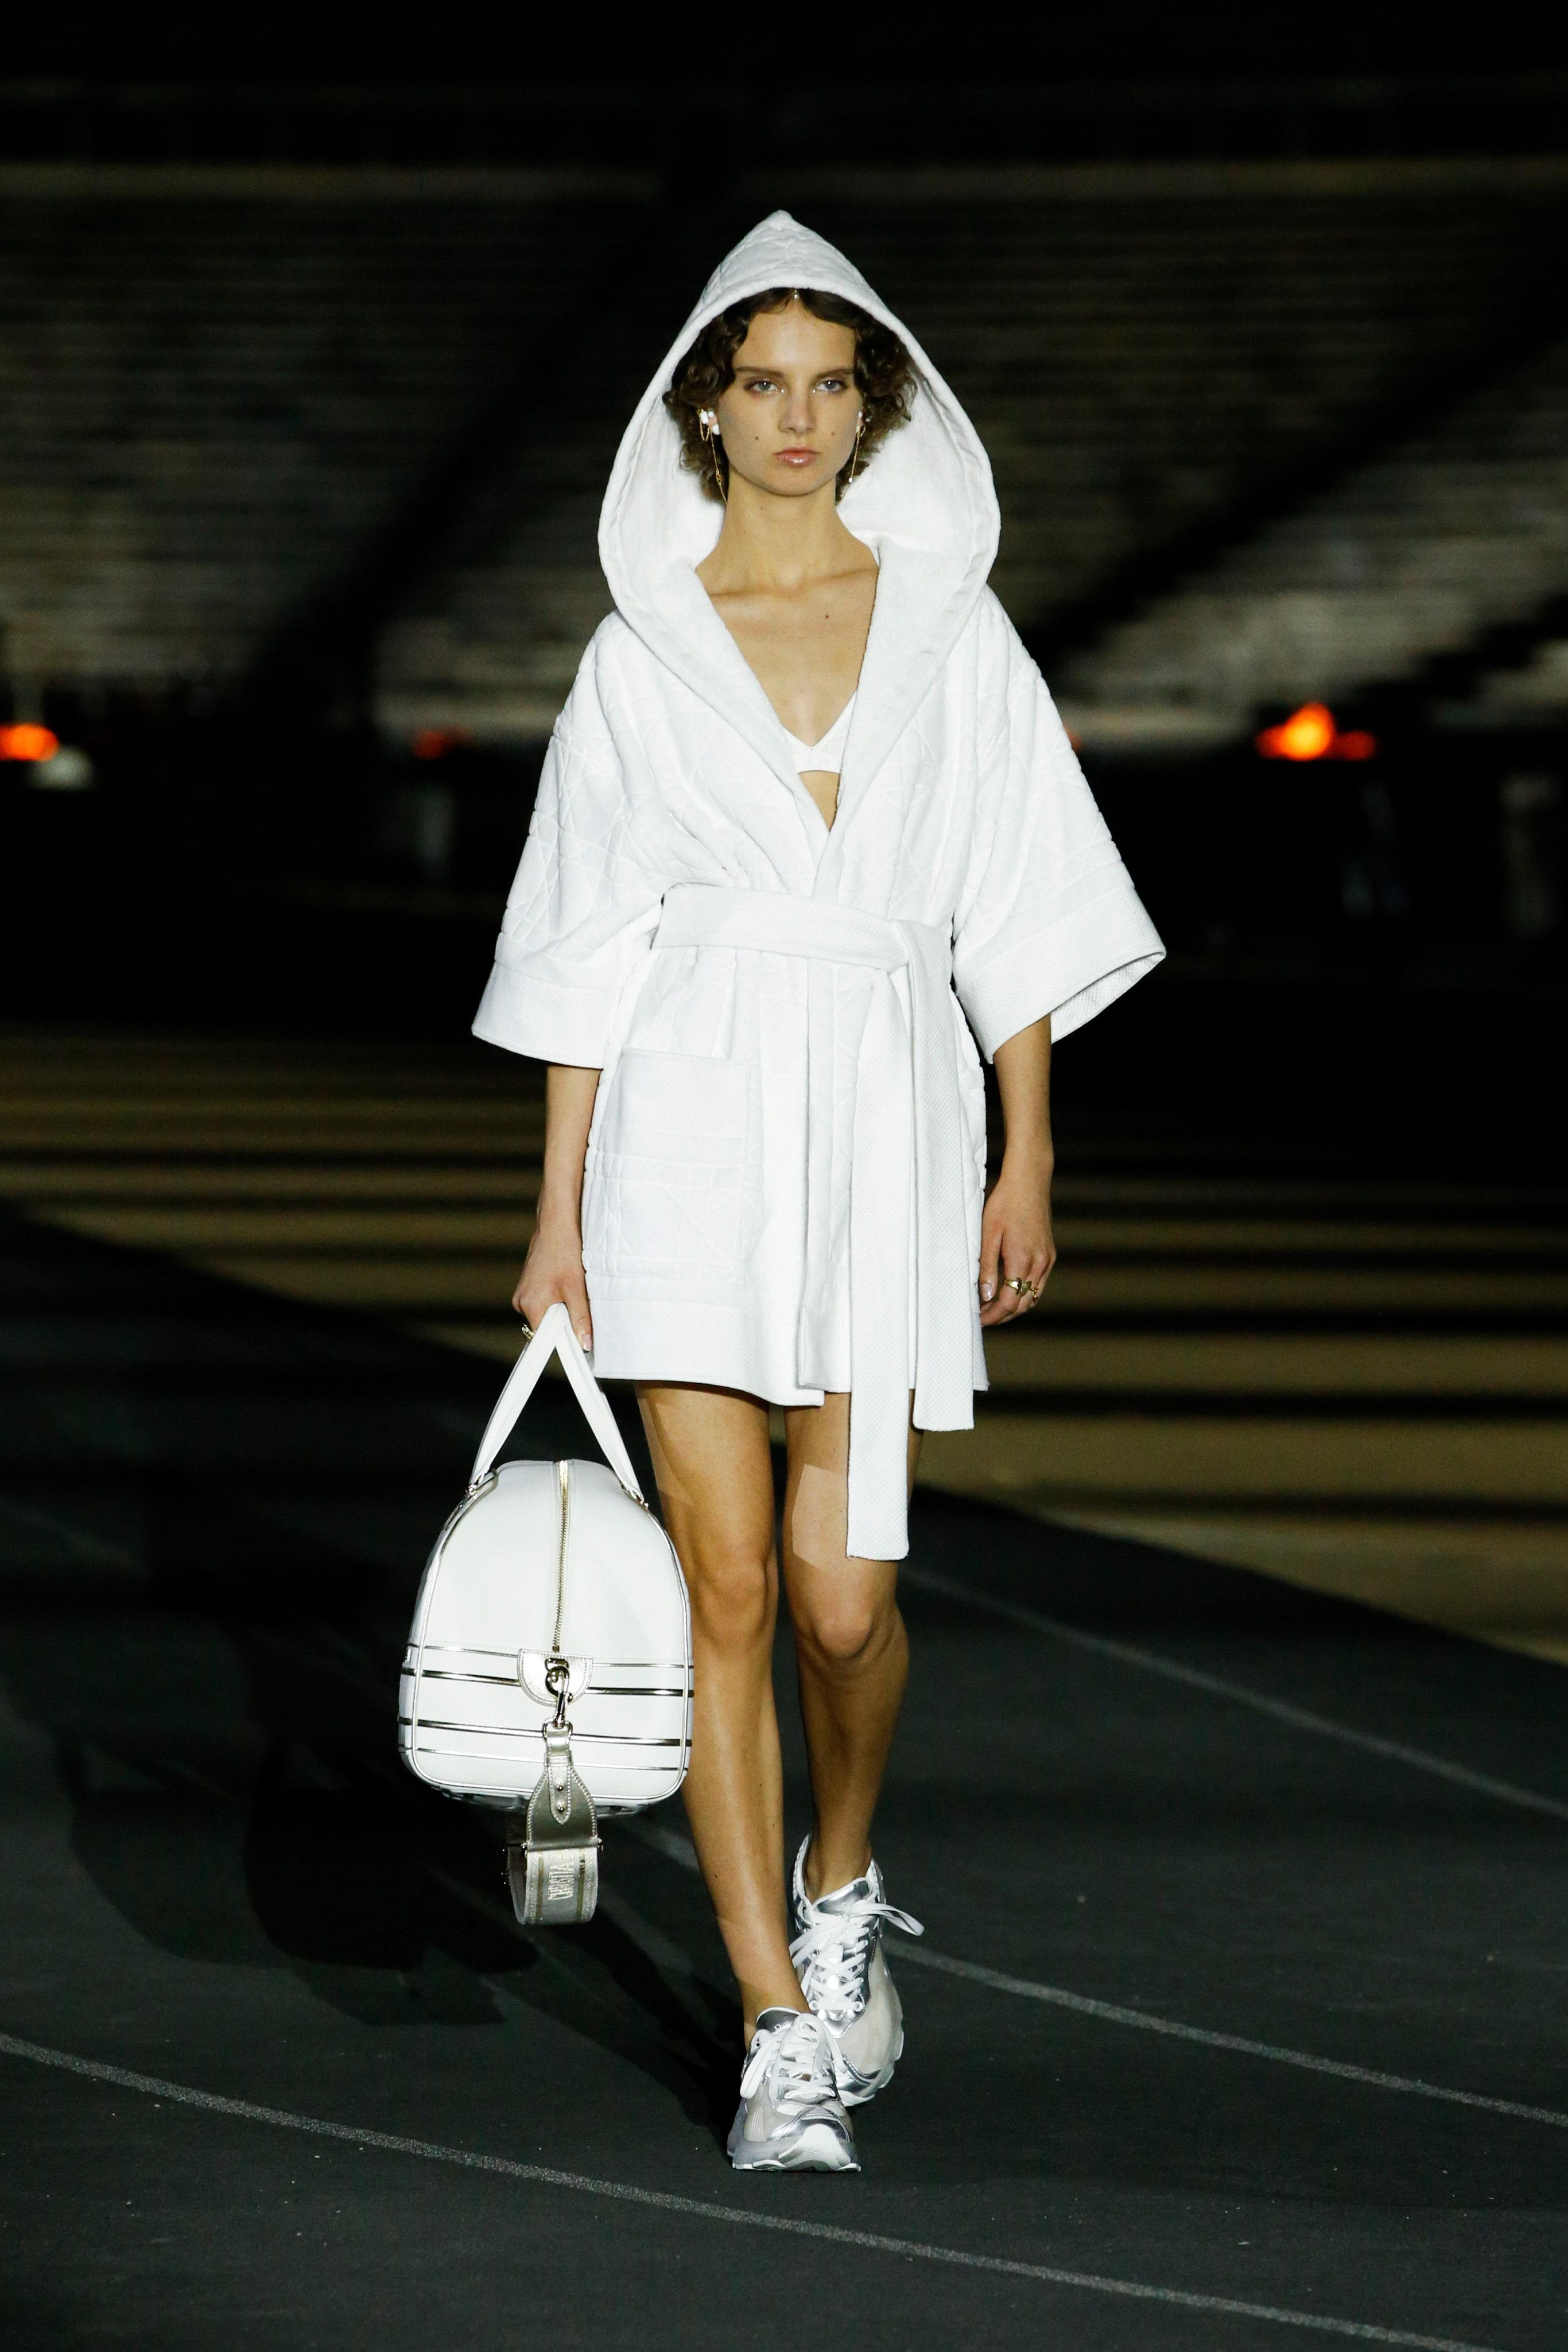 00046-Dior-Resort-2022-credit-brand.jpeg